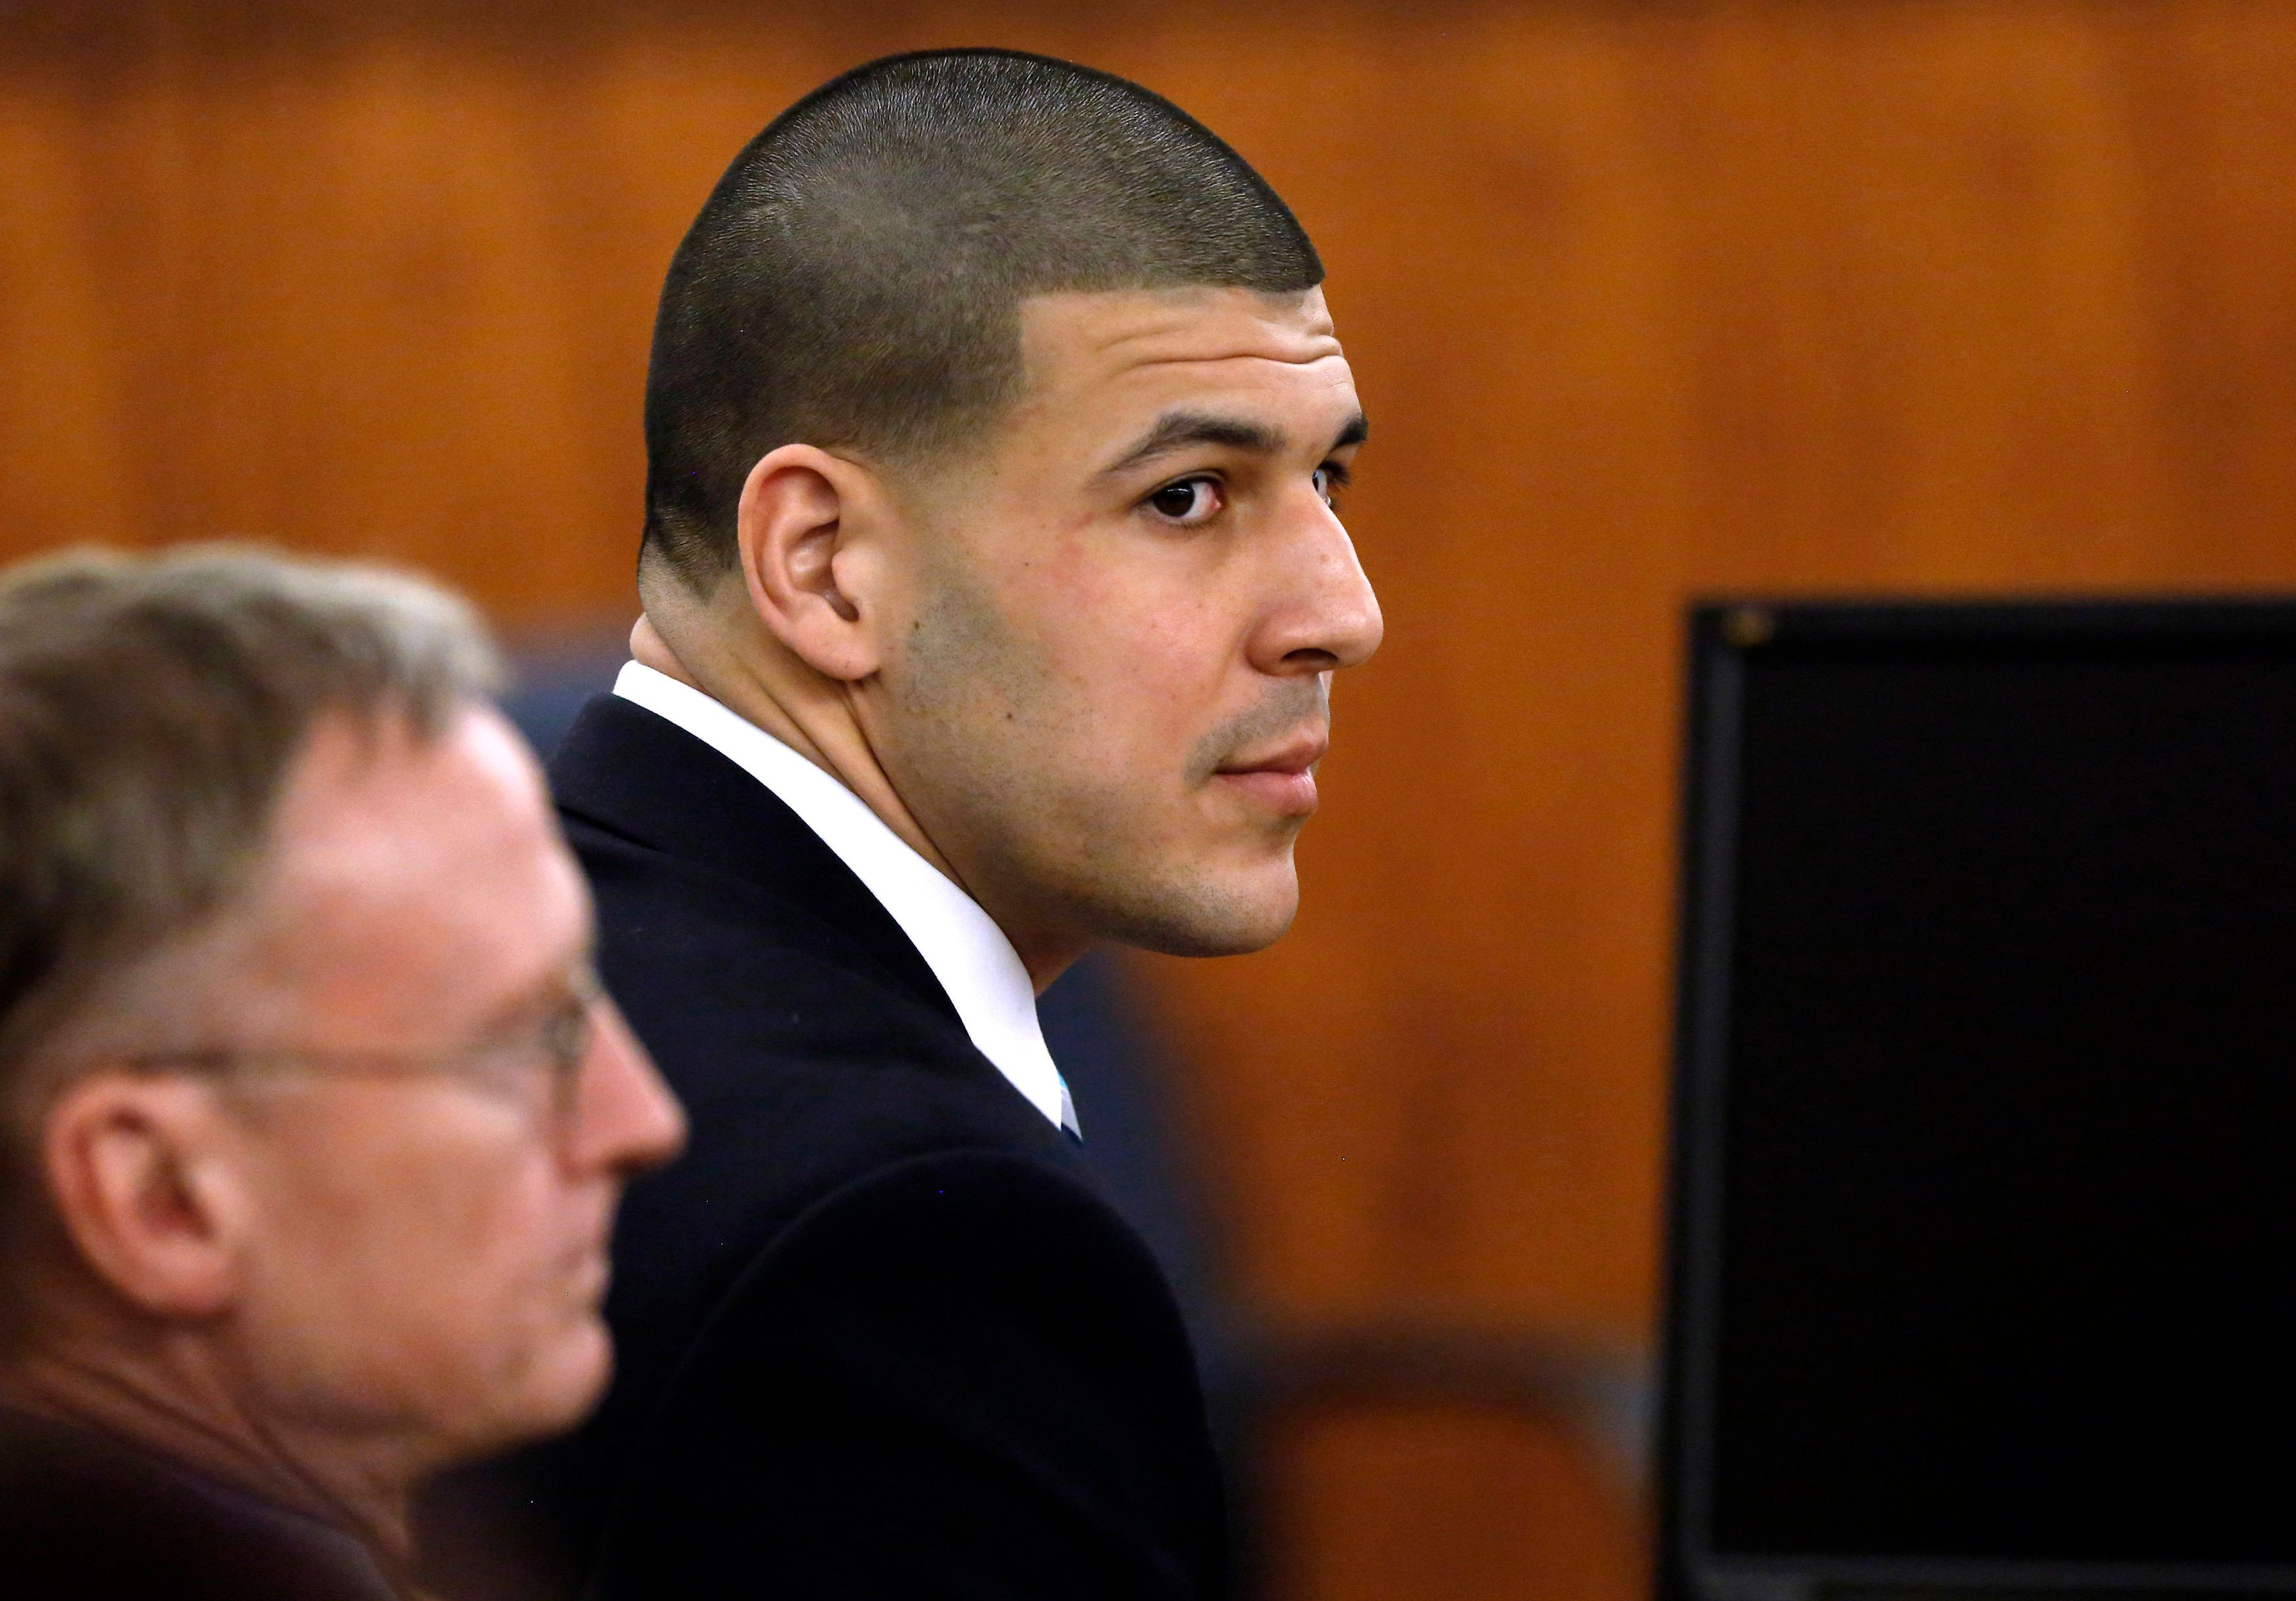 Former NFL Star, Convicted Murderer Aaron Hernandez Dead In Apparent